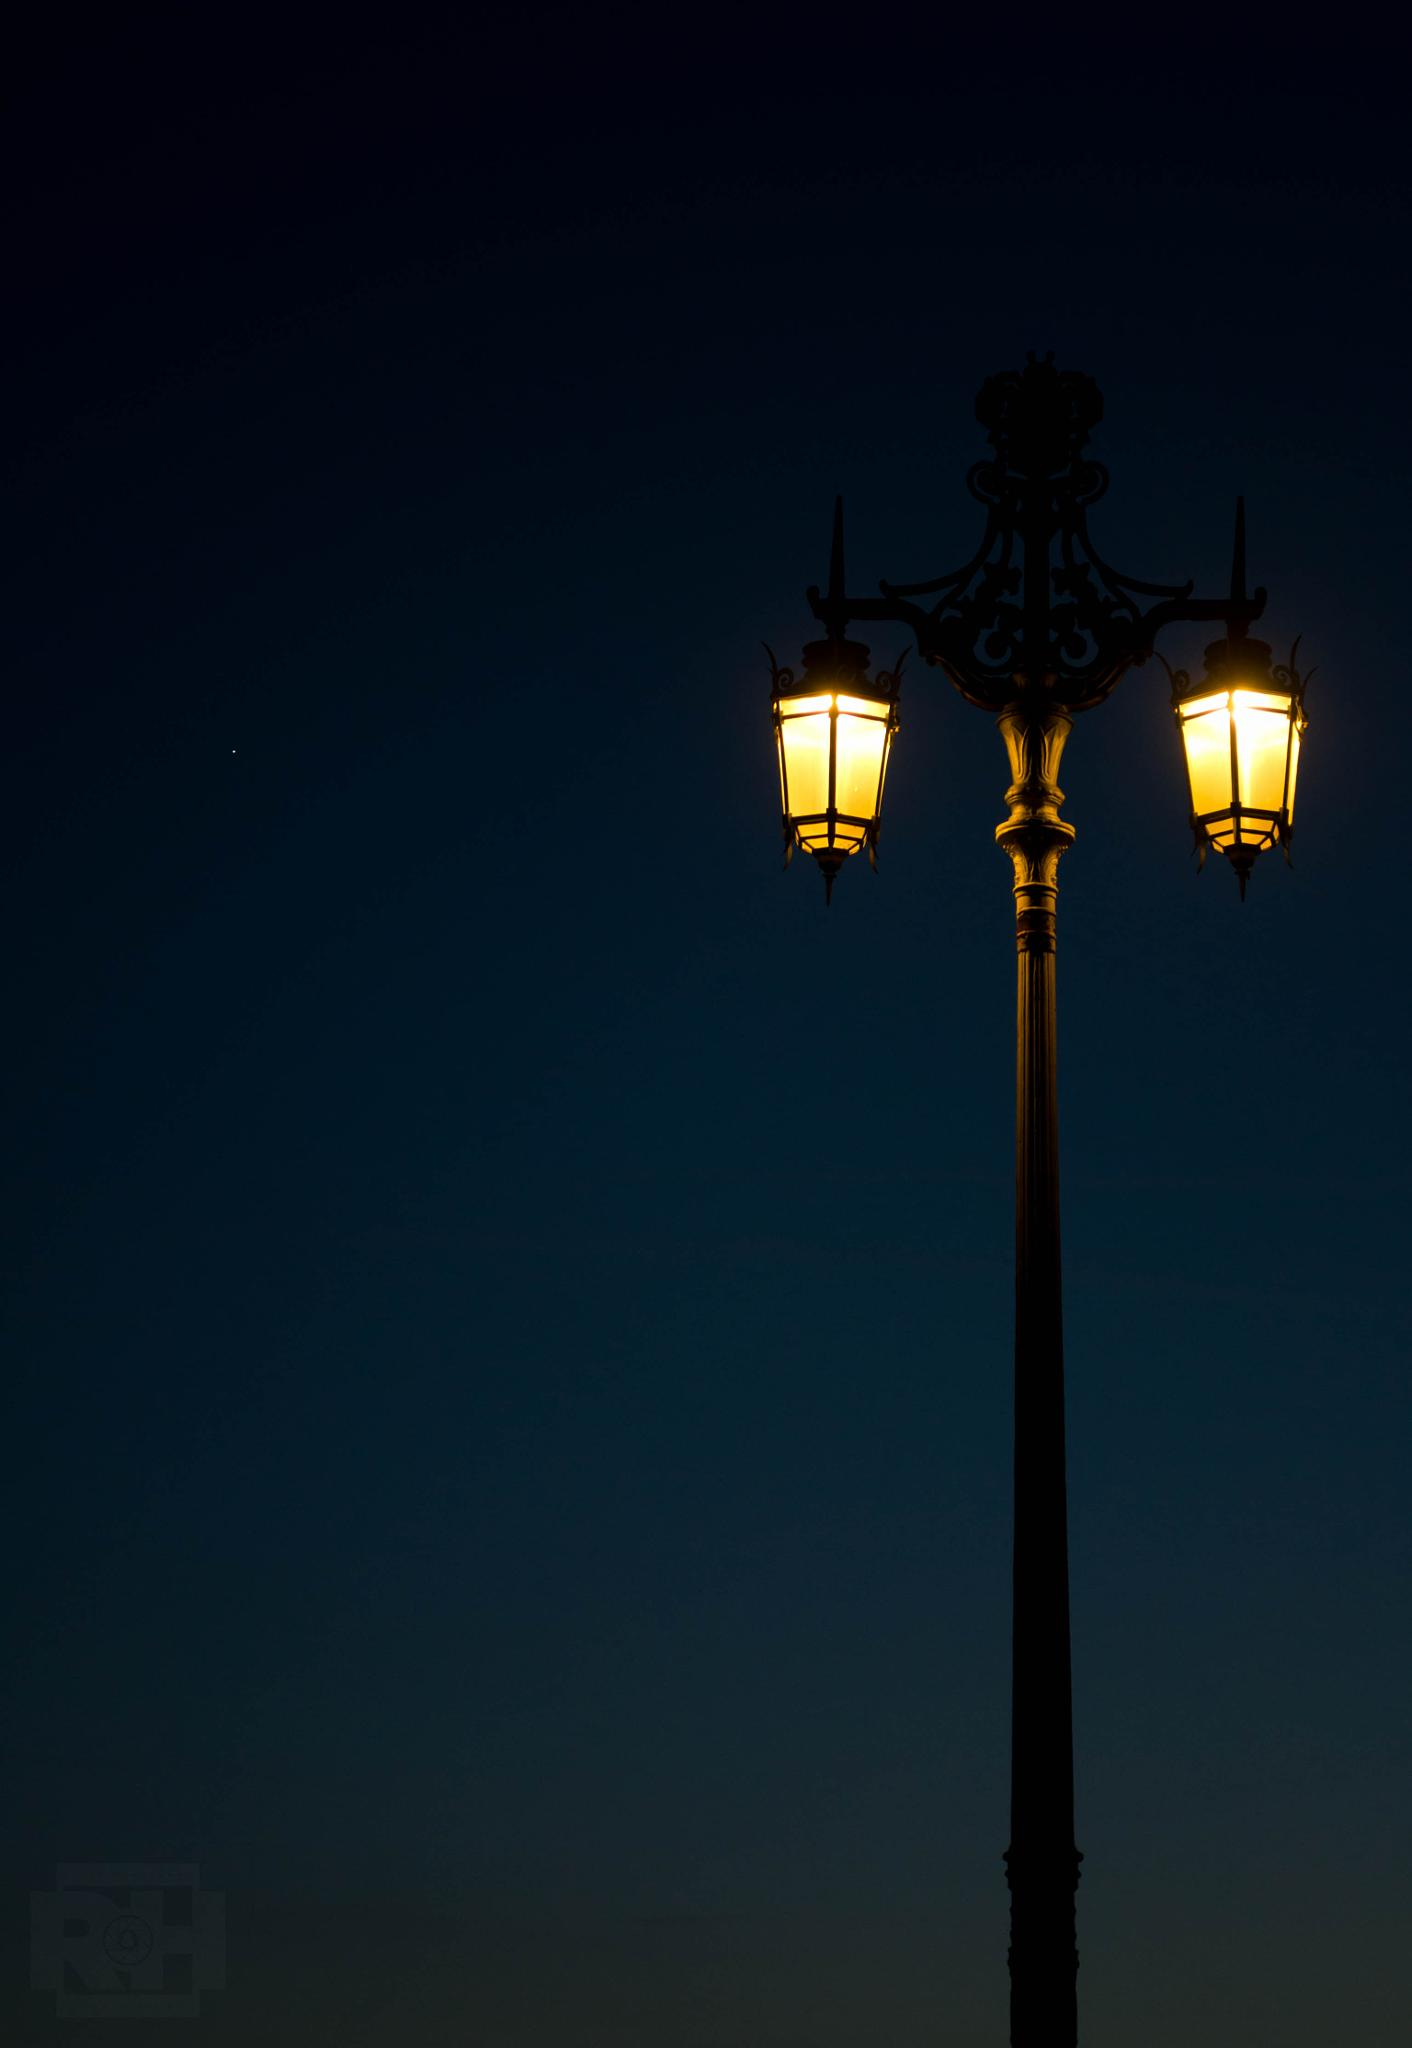 nightlights... by neil.hickman1